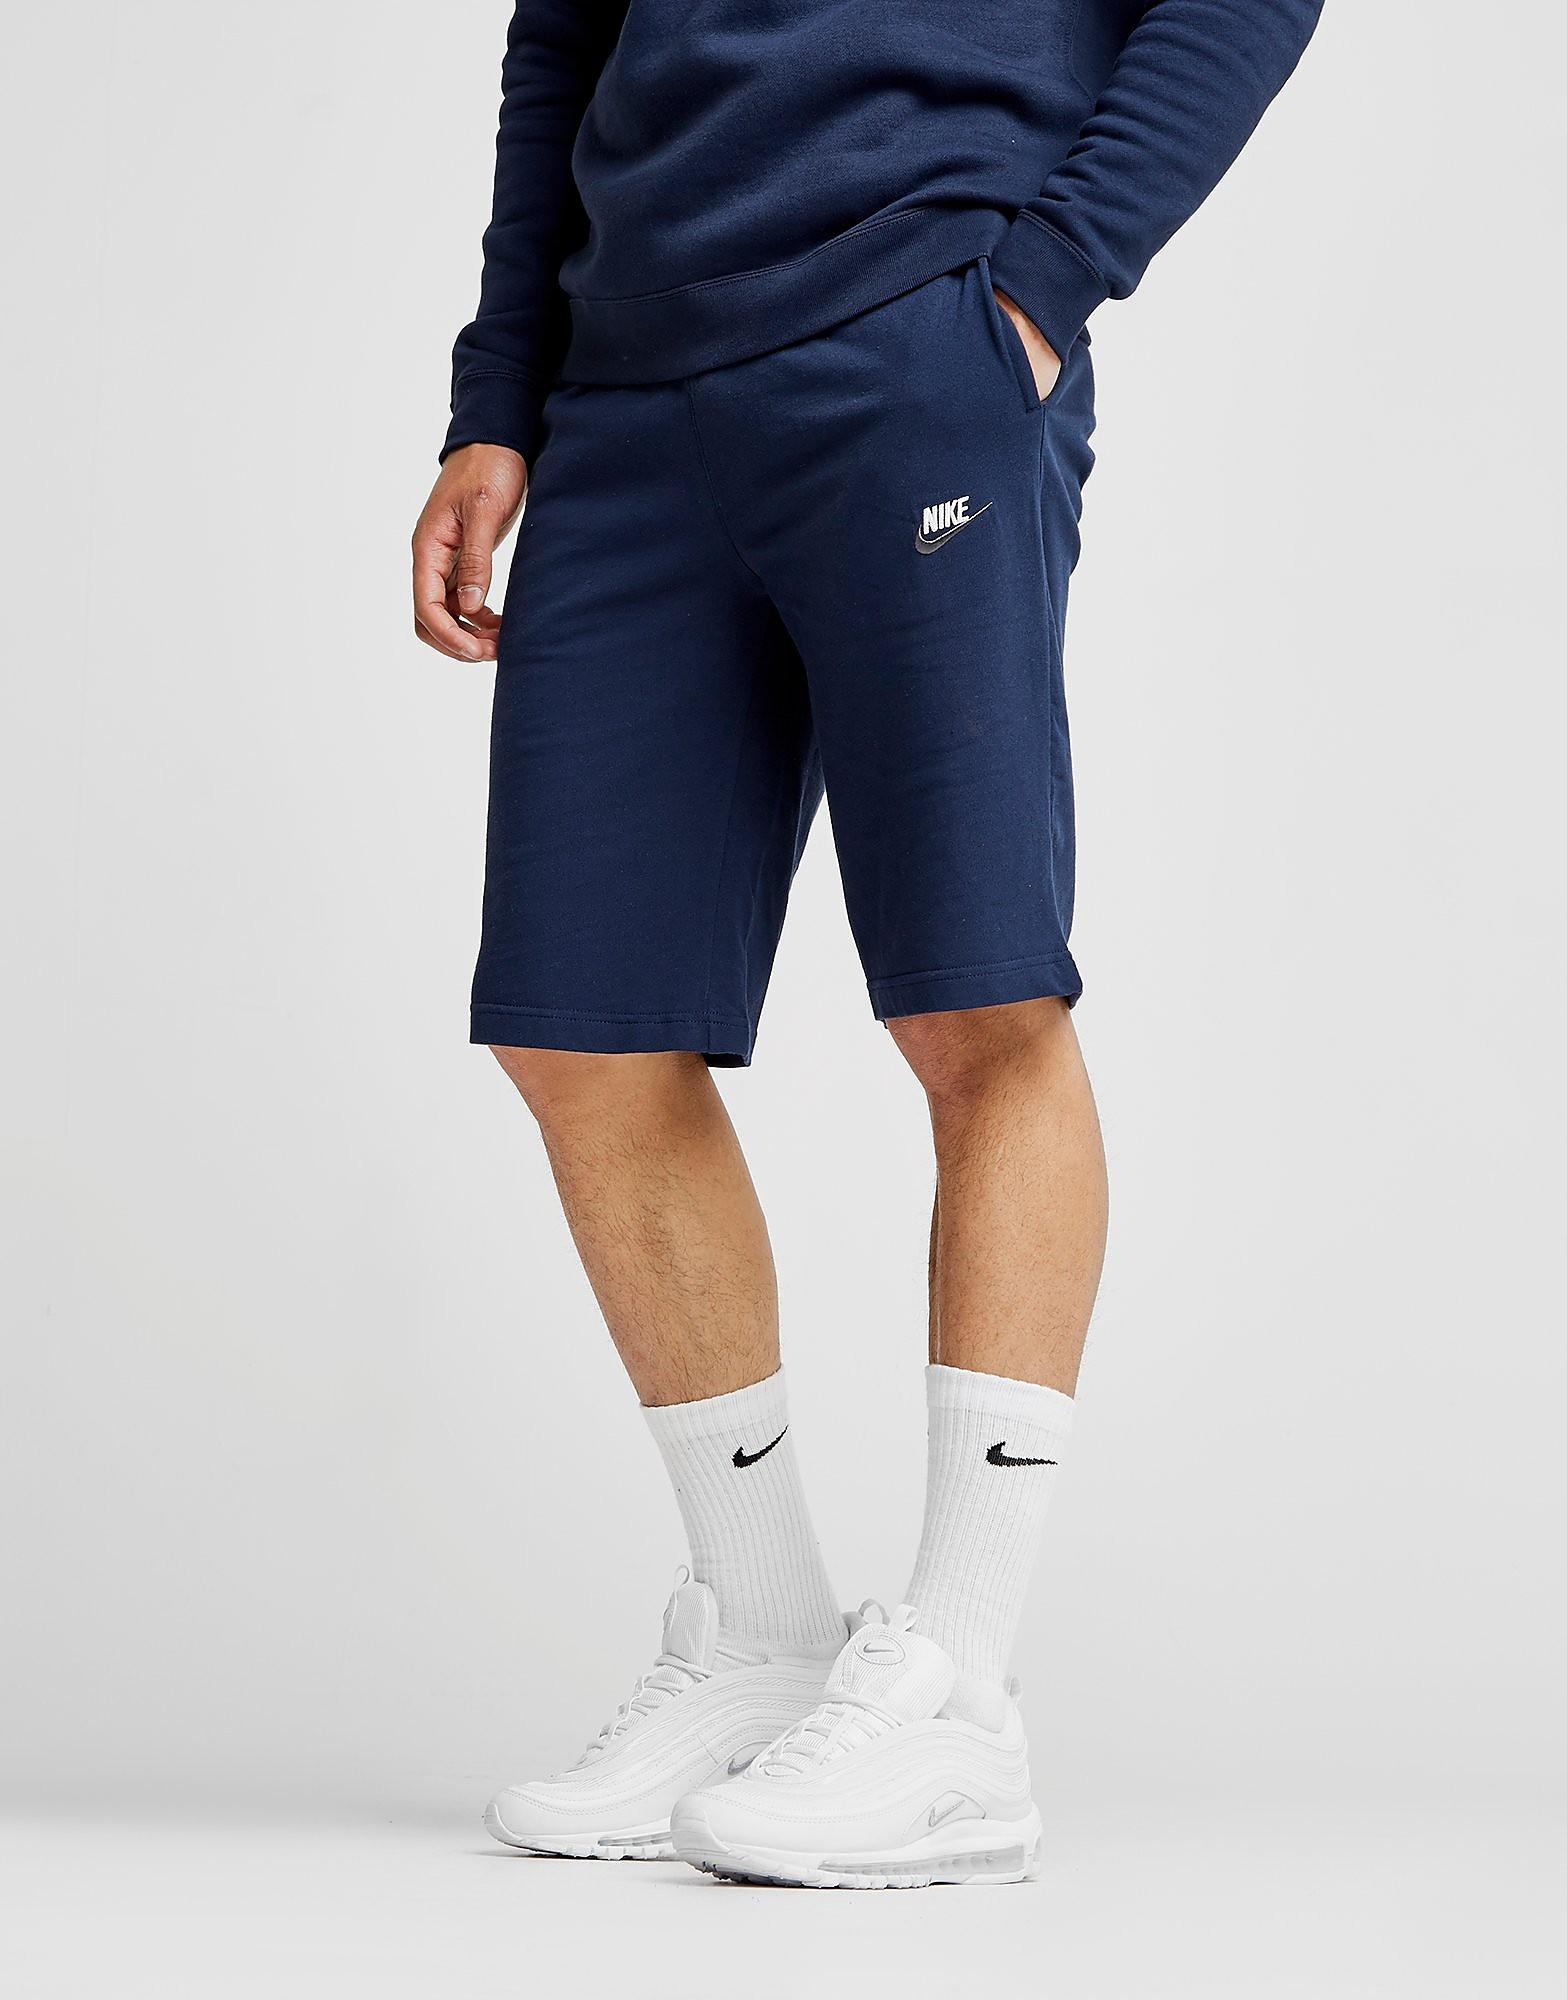 Nike pantalón corto Foundation 2